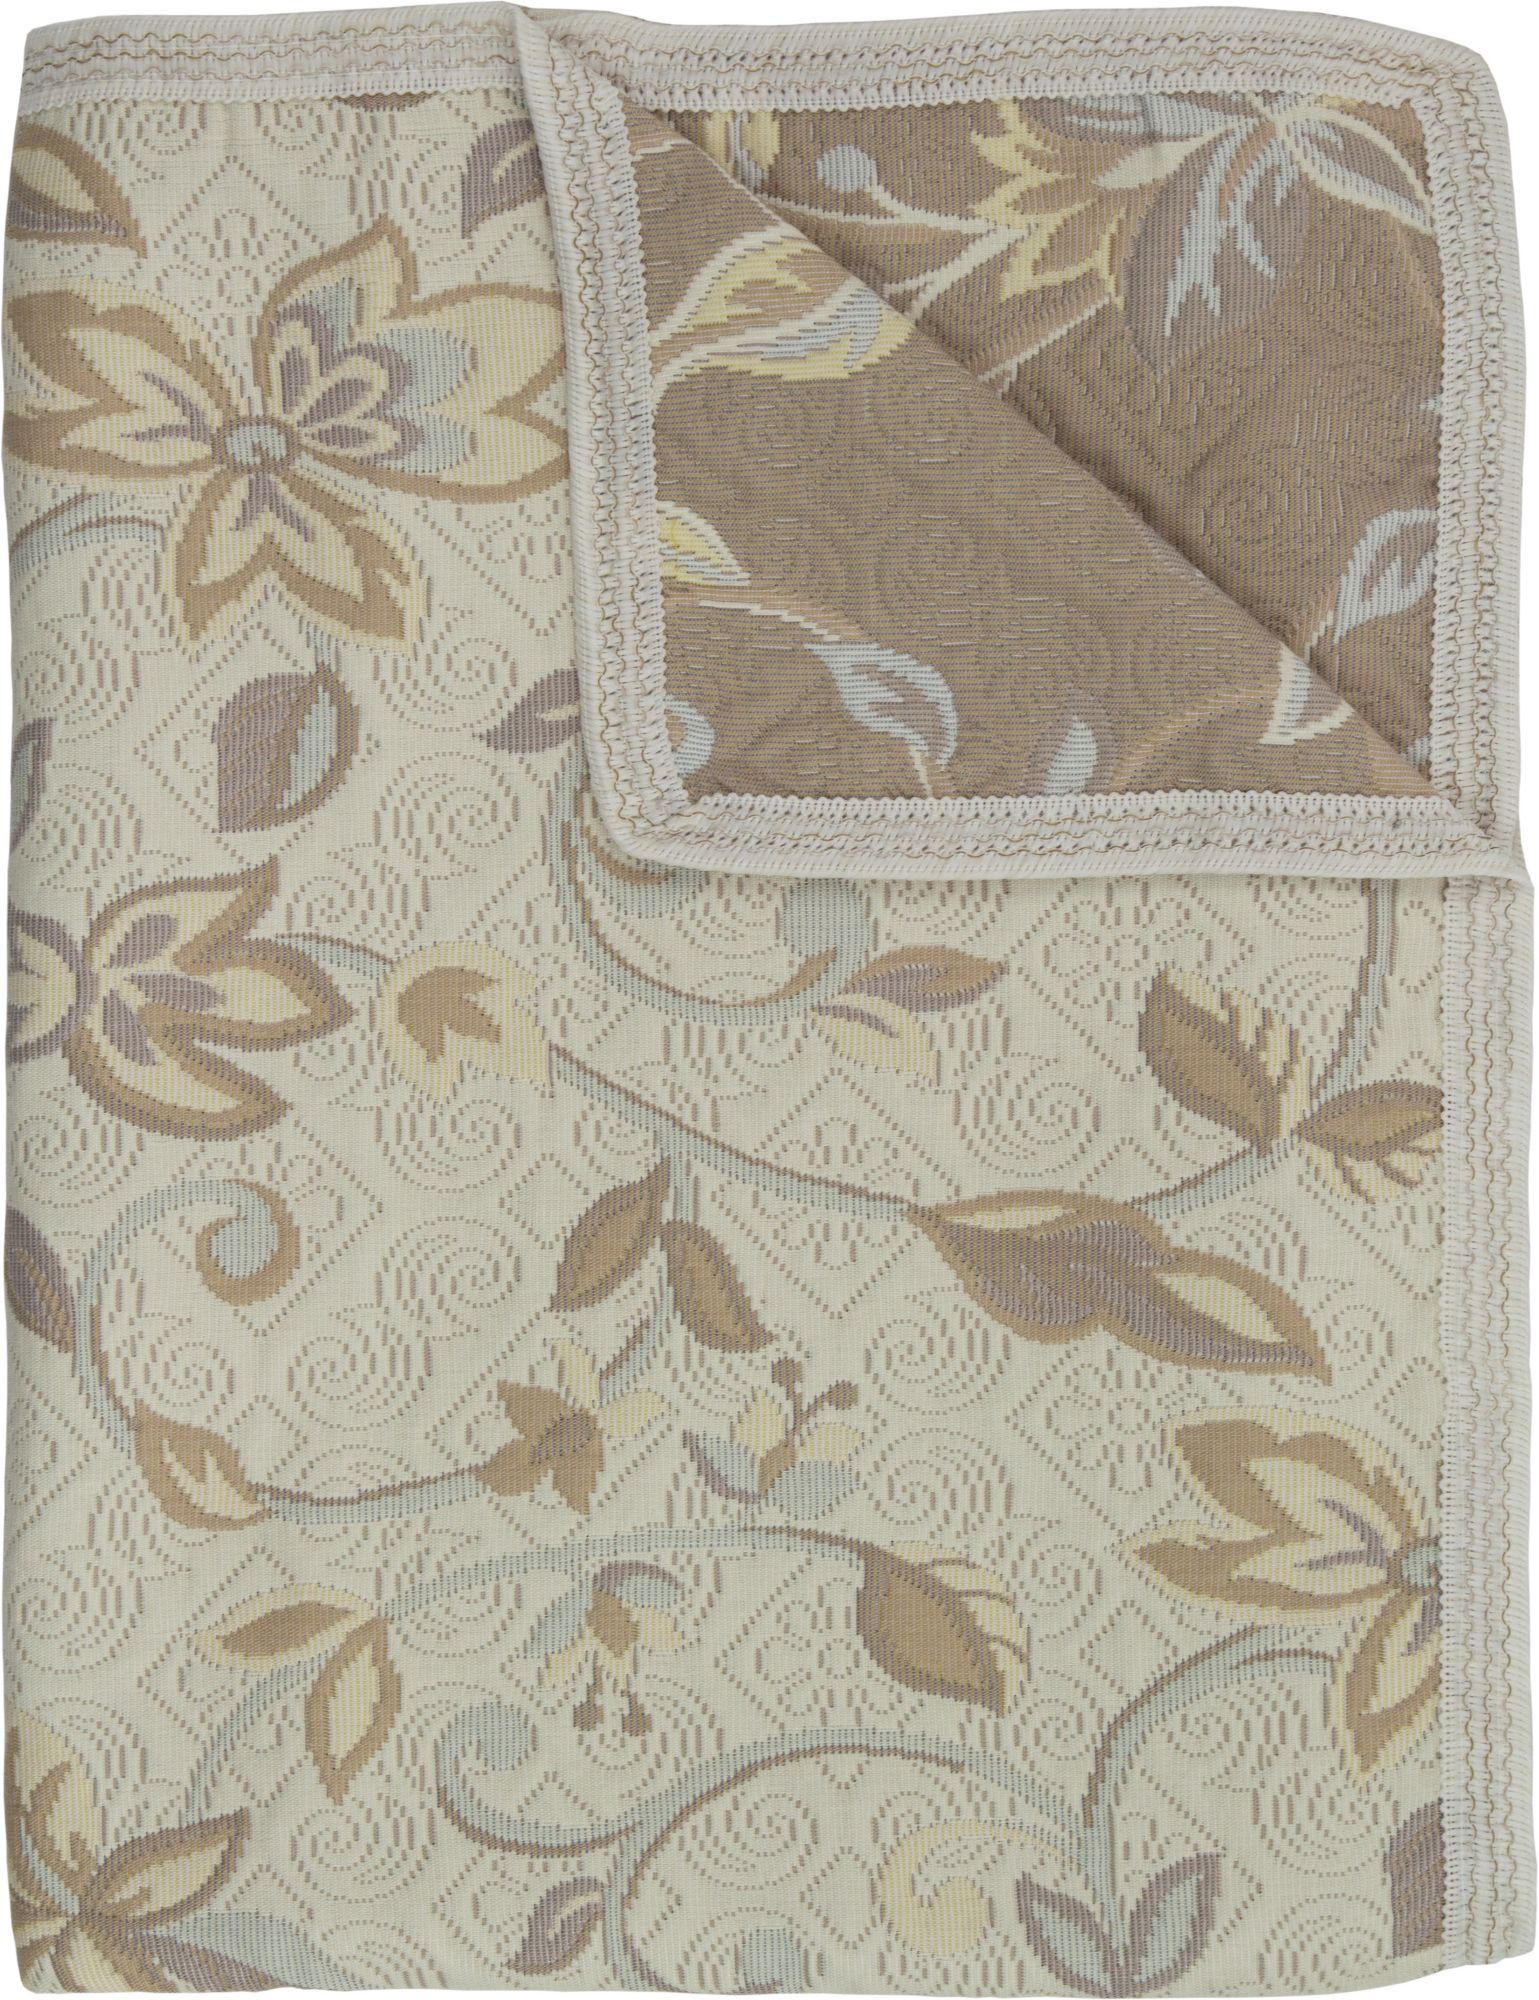 HAGEMANN Tagesdecke, Hagemann, »Orcadia«, florales Muster